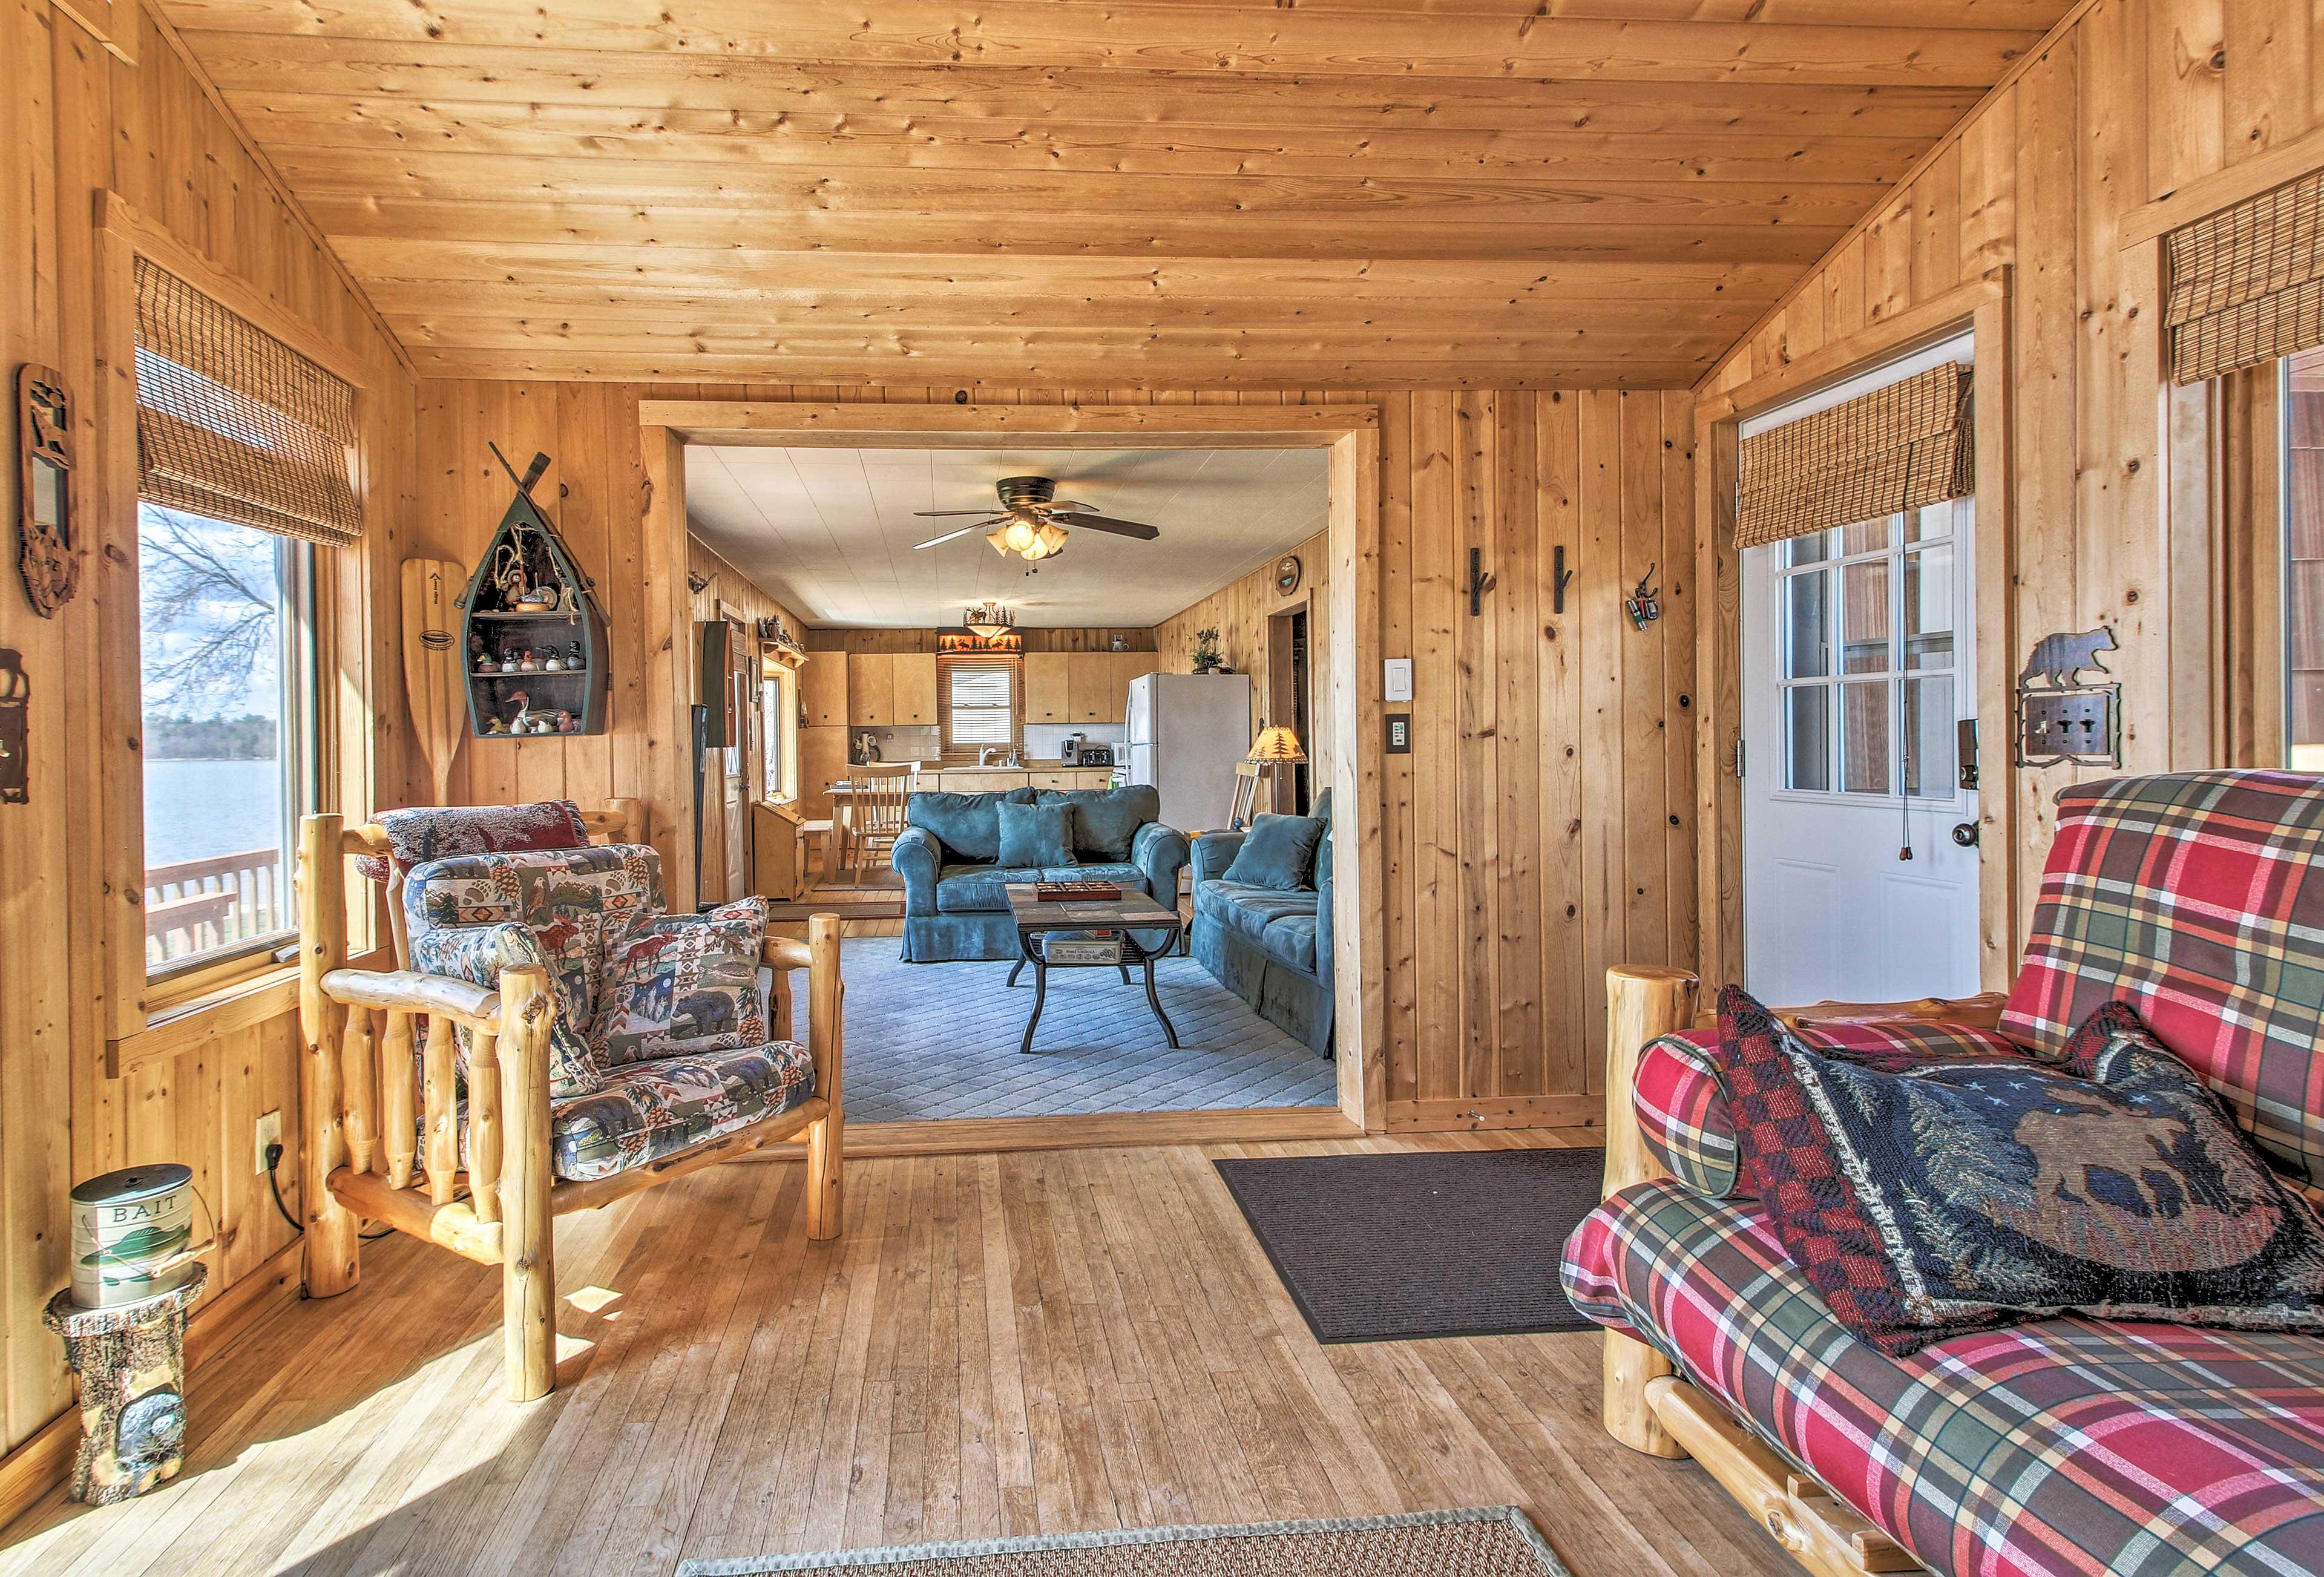 The four-season porch is cozy offering a futon to sleep on.